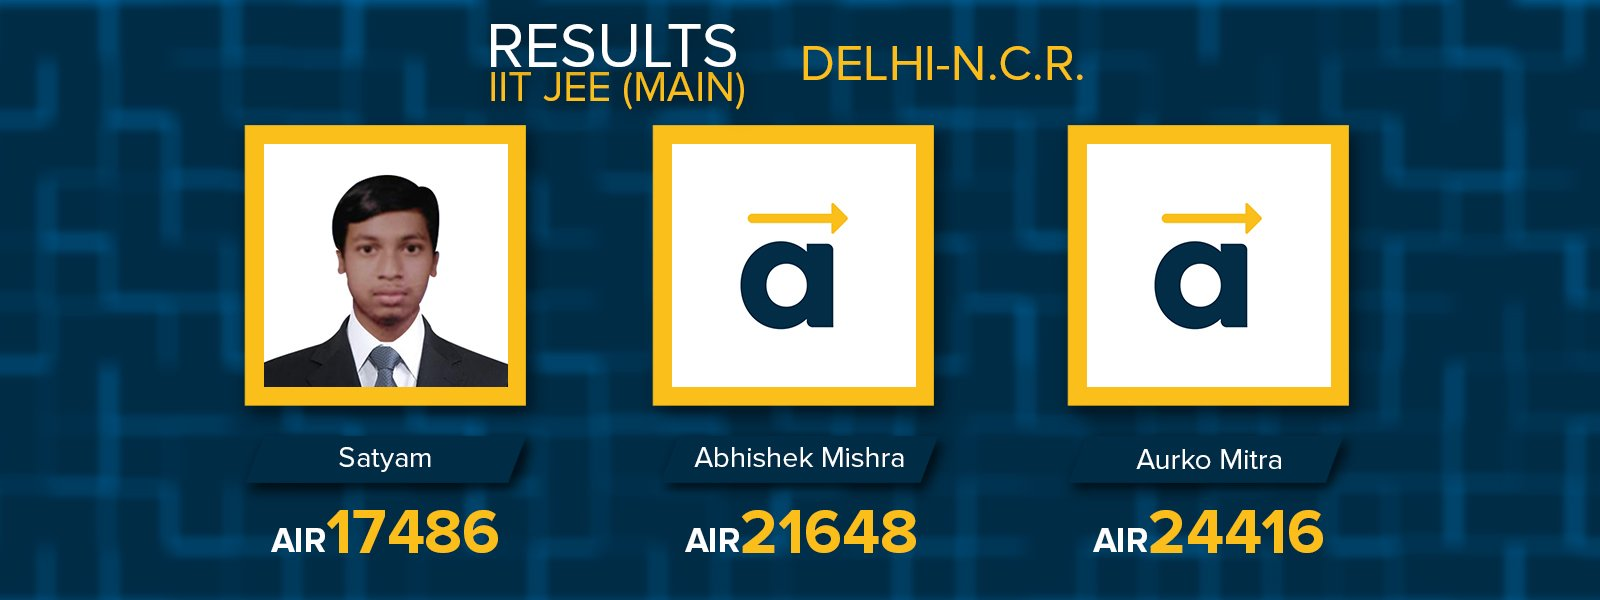 Delhi NCR IIT JEE Main 2017 results